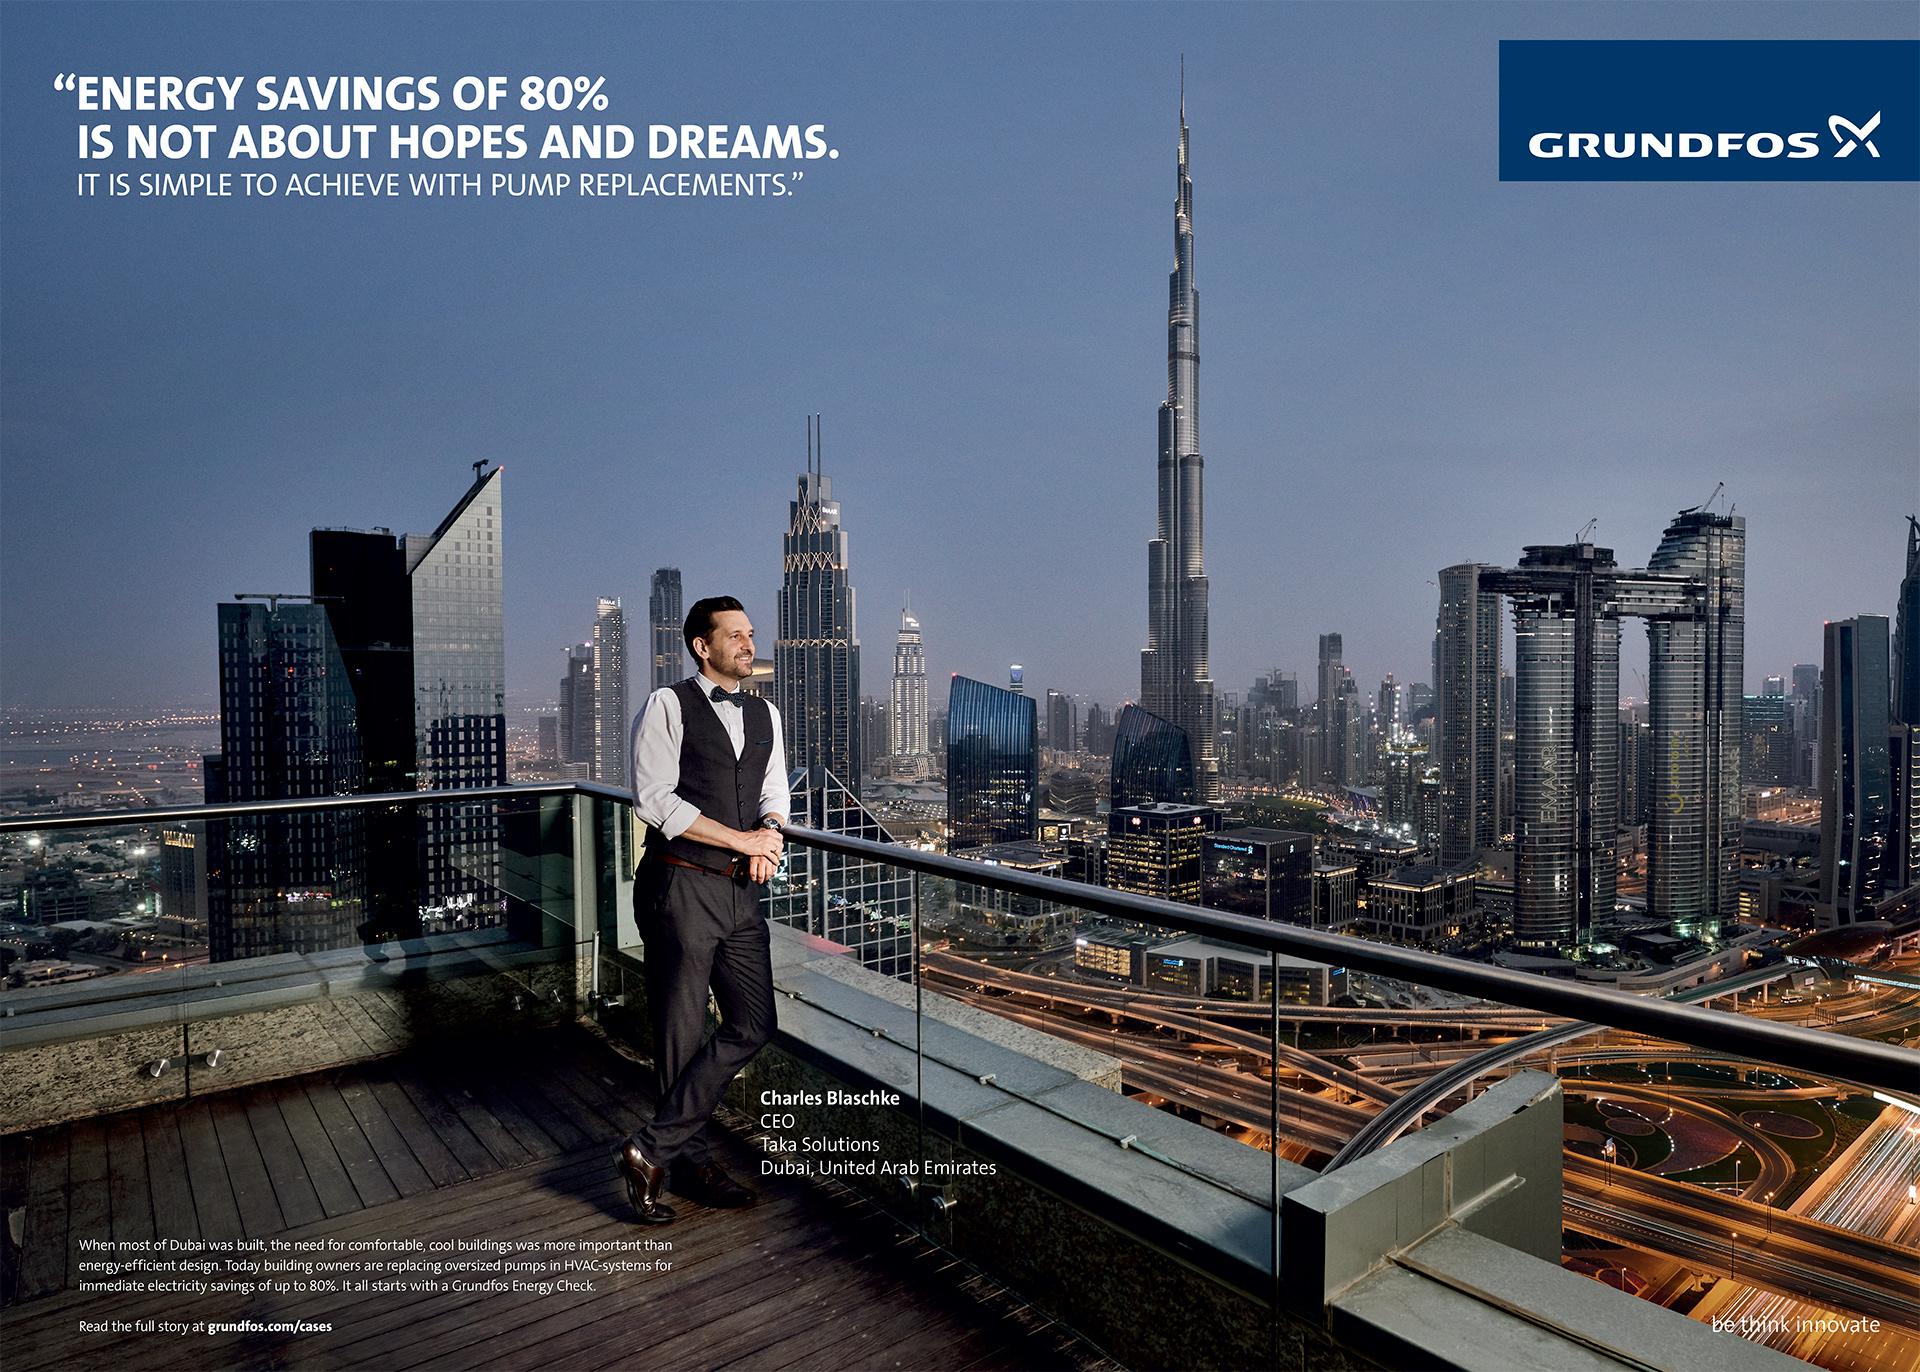 4011119_GFSS_Grundfos-Stories_Dubai_Poster-Society_1400x1000mm_25mmBleed_ART04_UNT_ISOCoatedV2